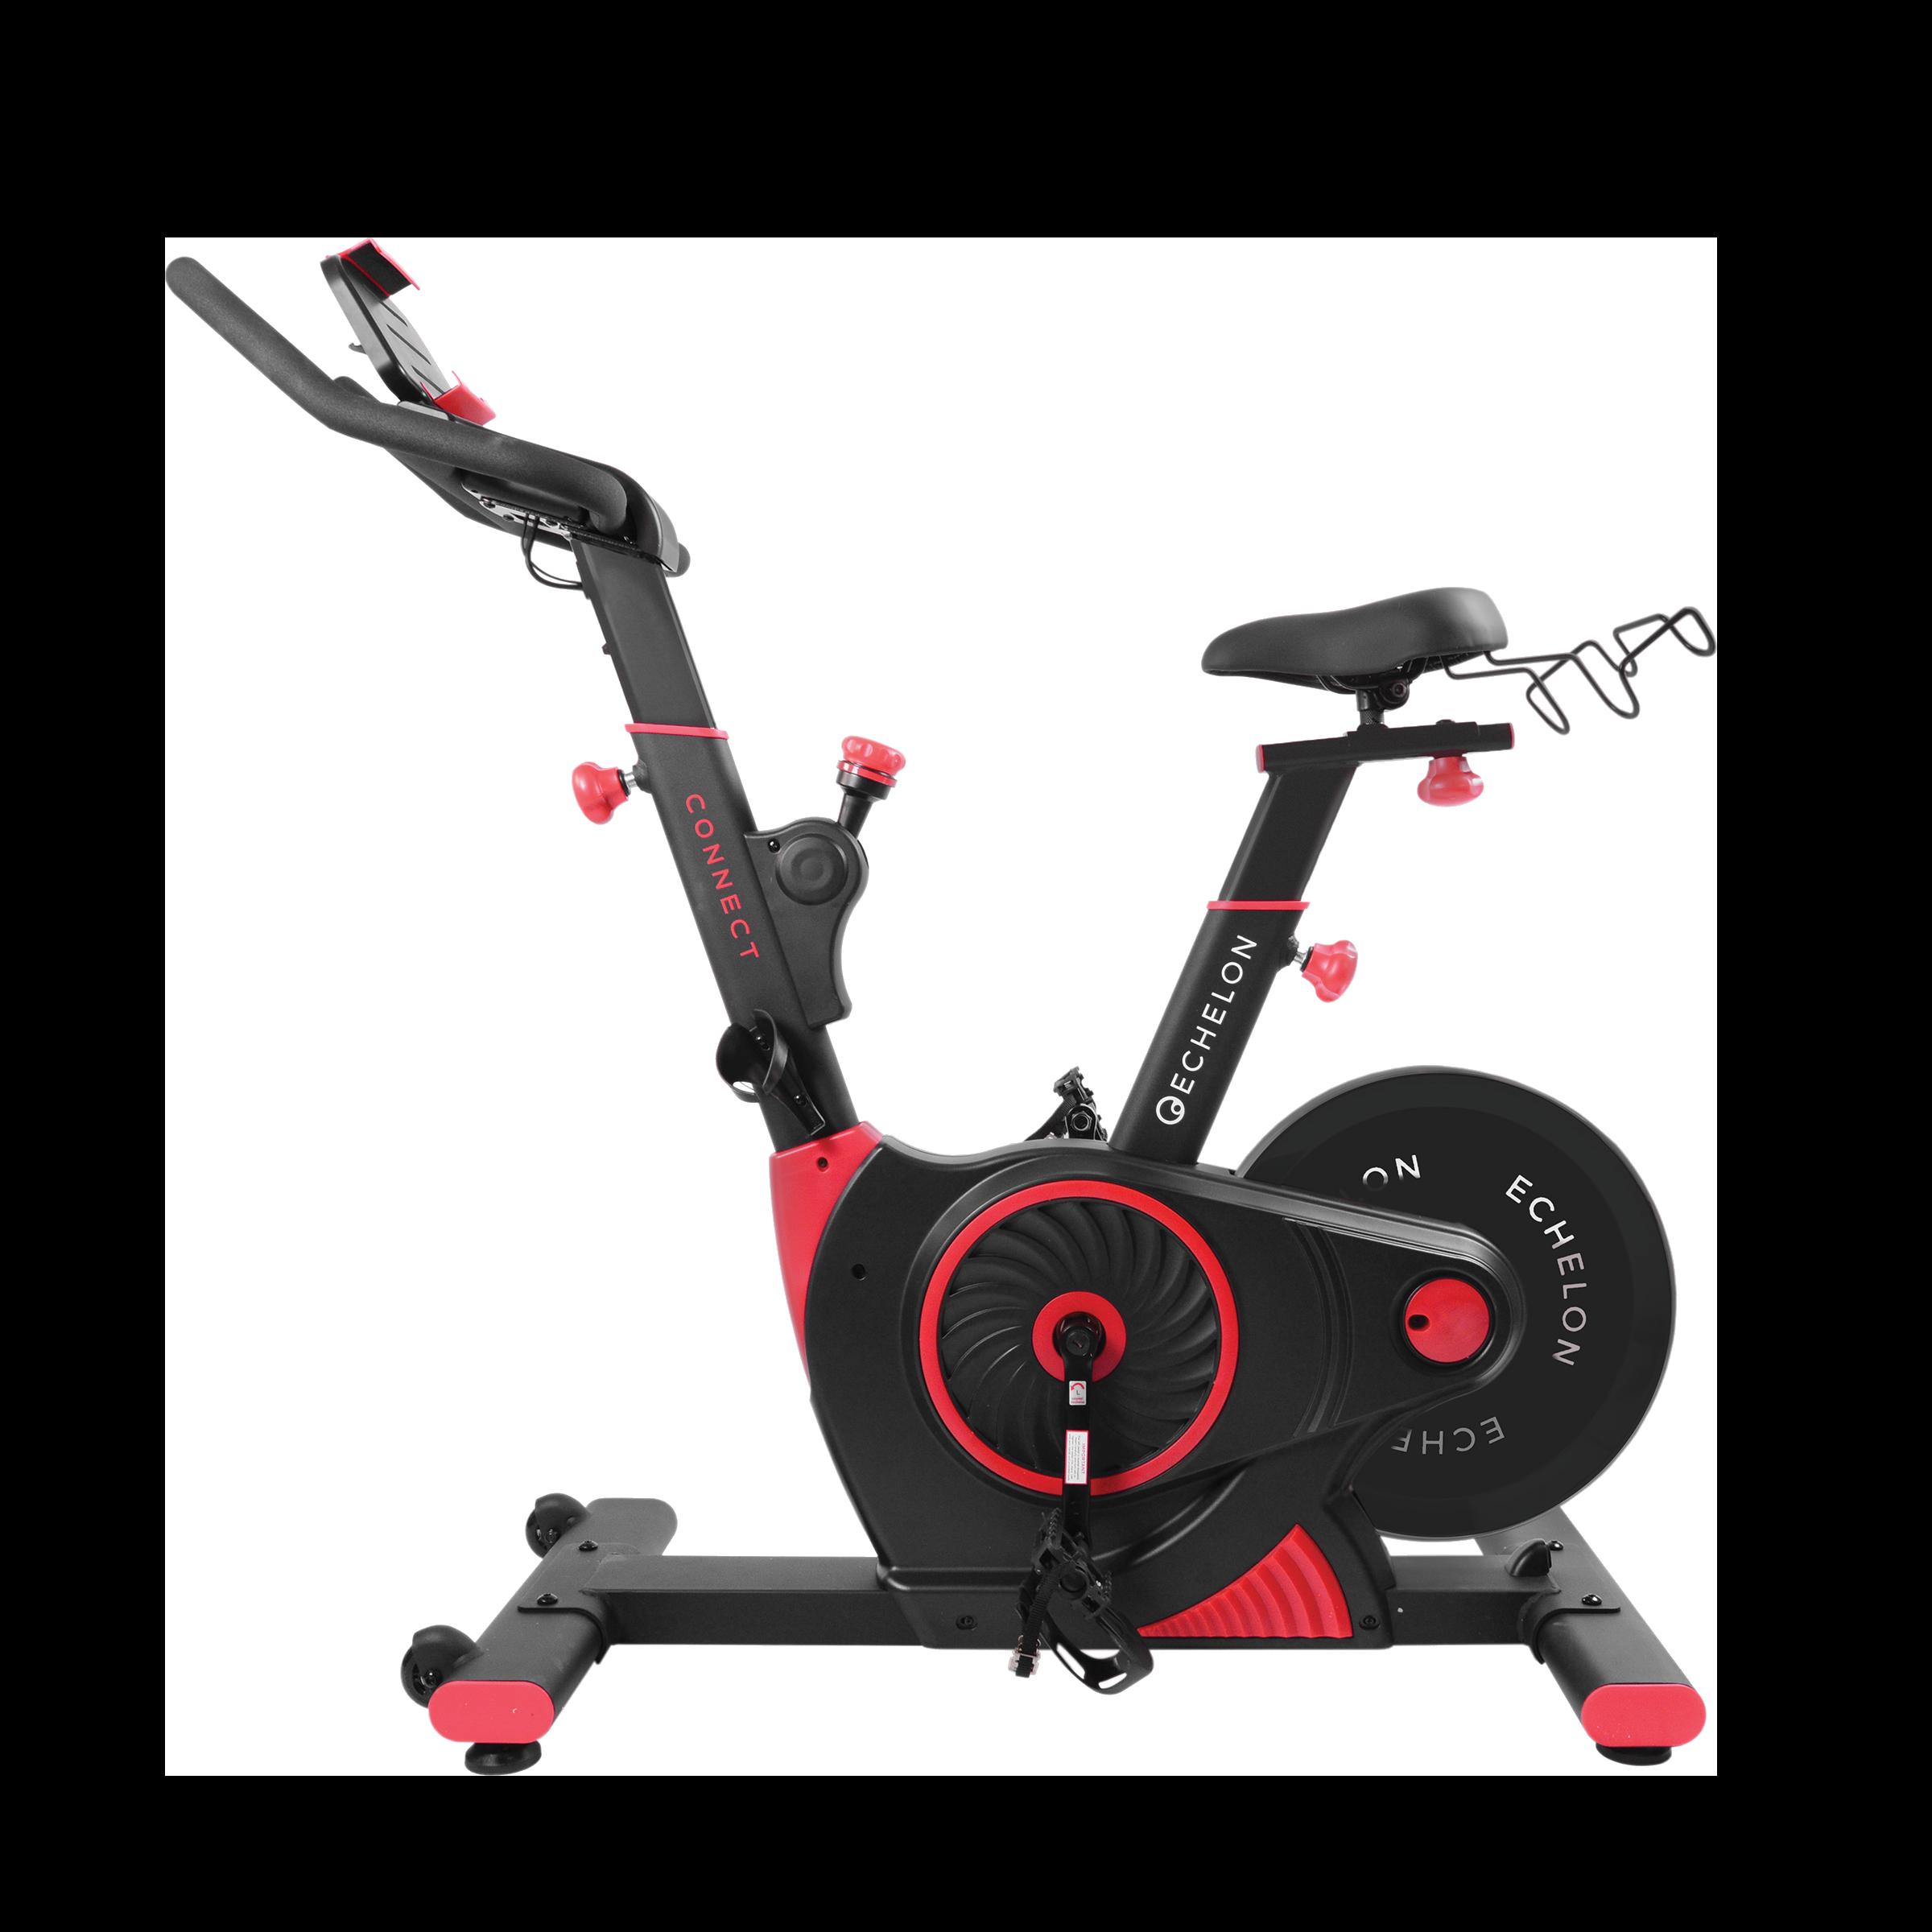 Echelon Smart Connect Bike Ex1 Indoor Bike Workouts Biking